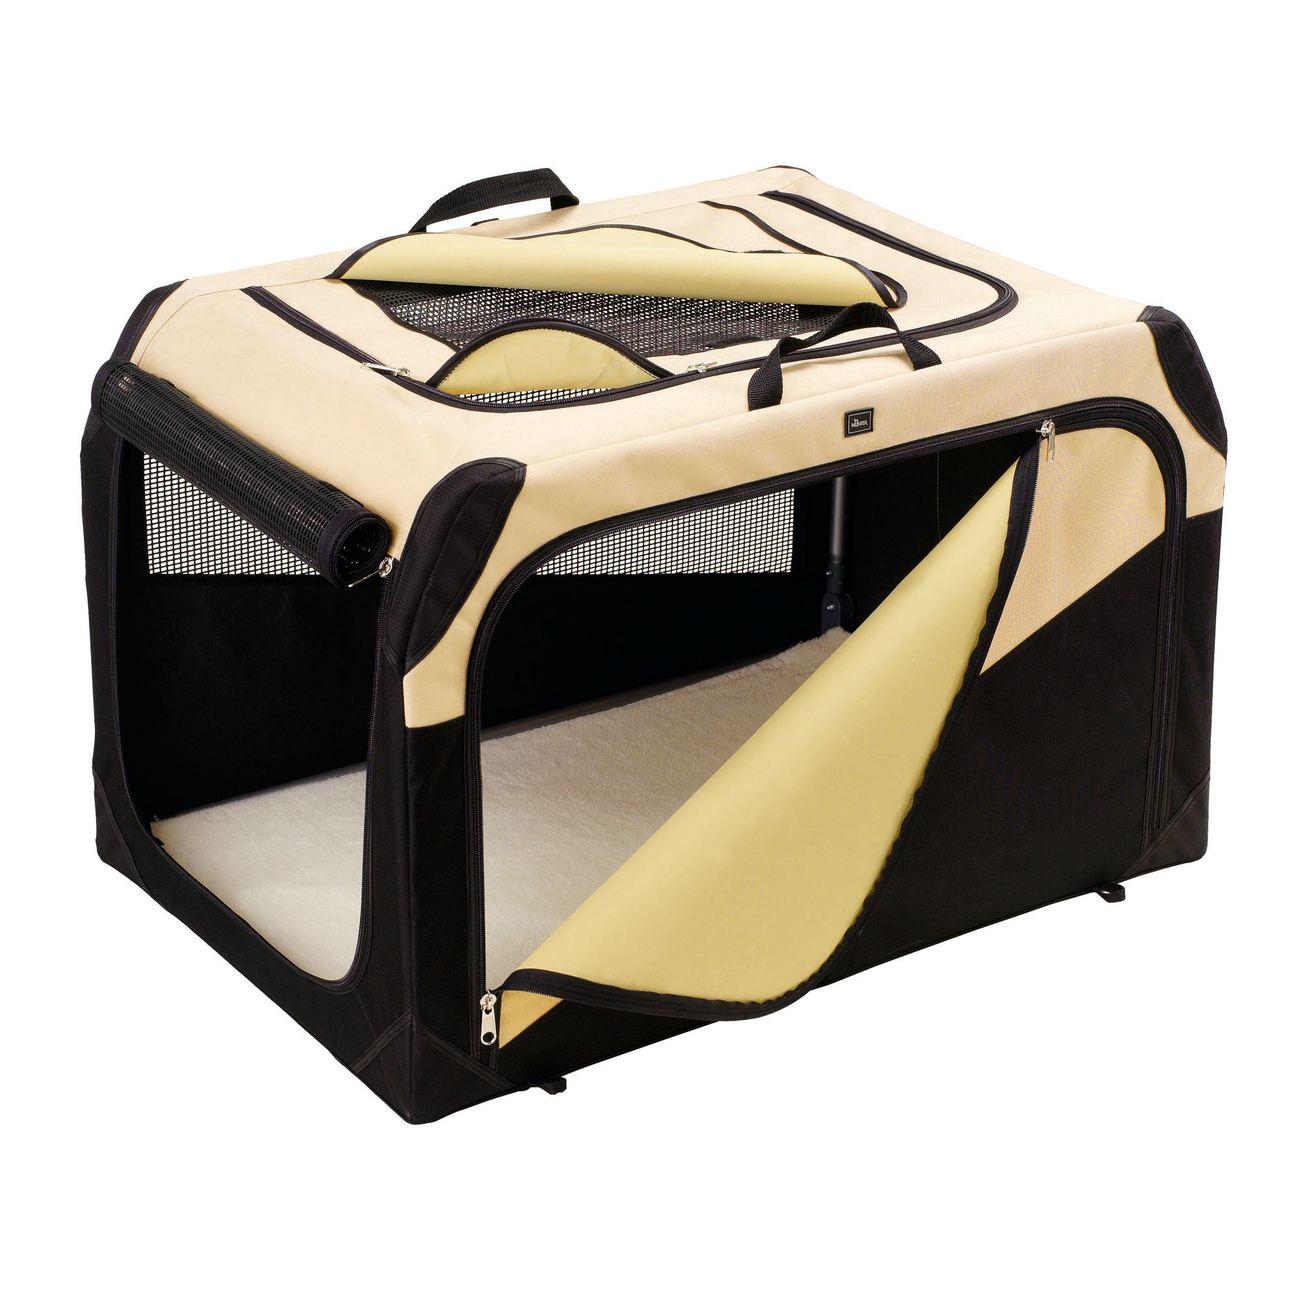 Hunter Hundebox Transportbox faltbar, S: 61 x 46 x 43 cm